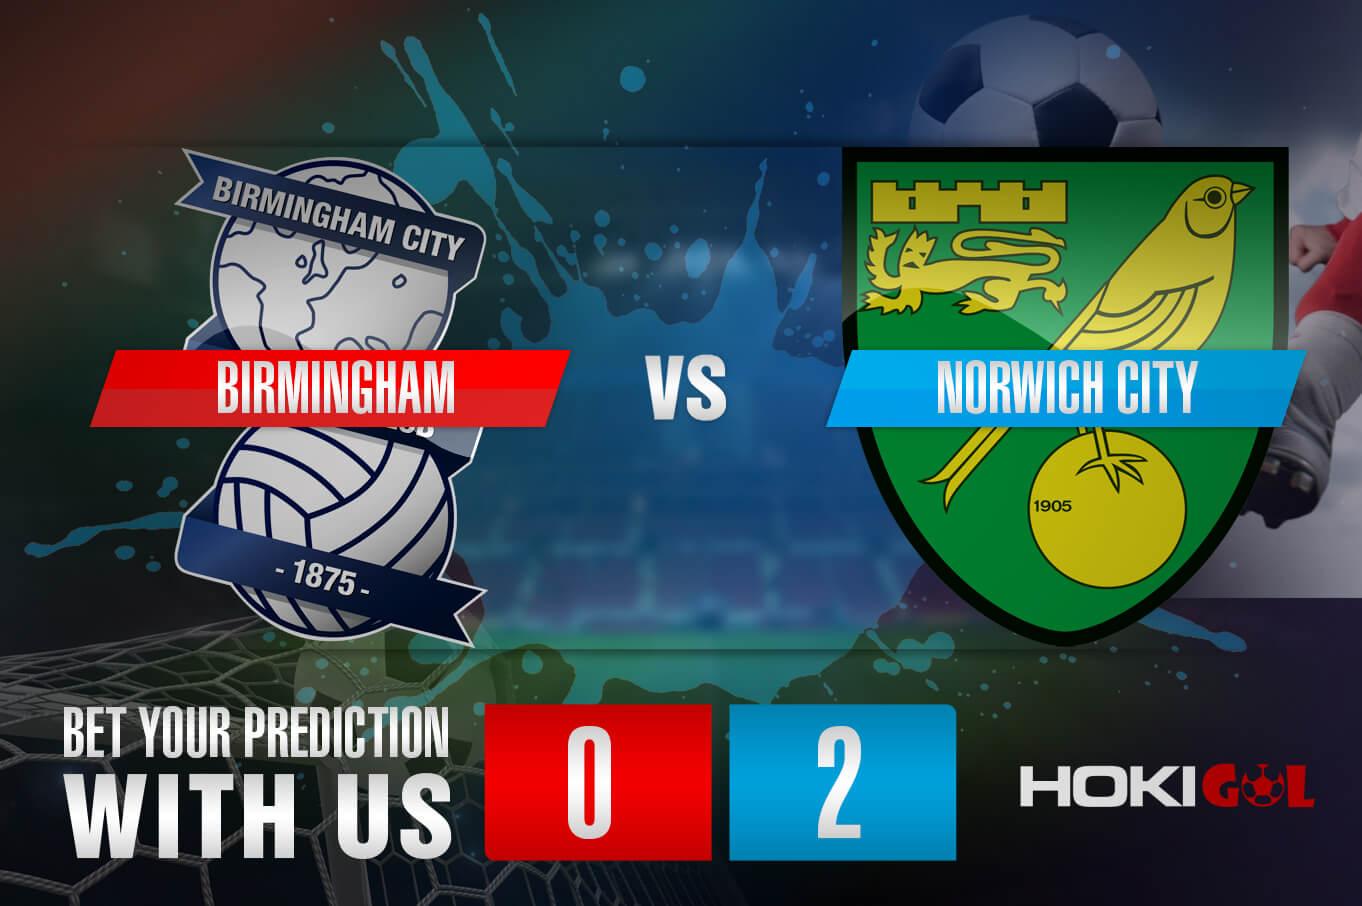 Prediksi Bola Birmingham Vs Norwich City 24 Februari 2021